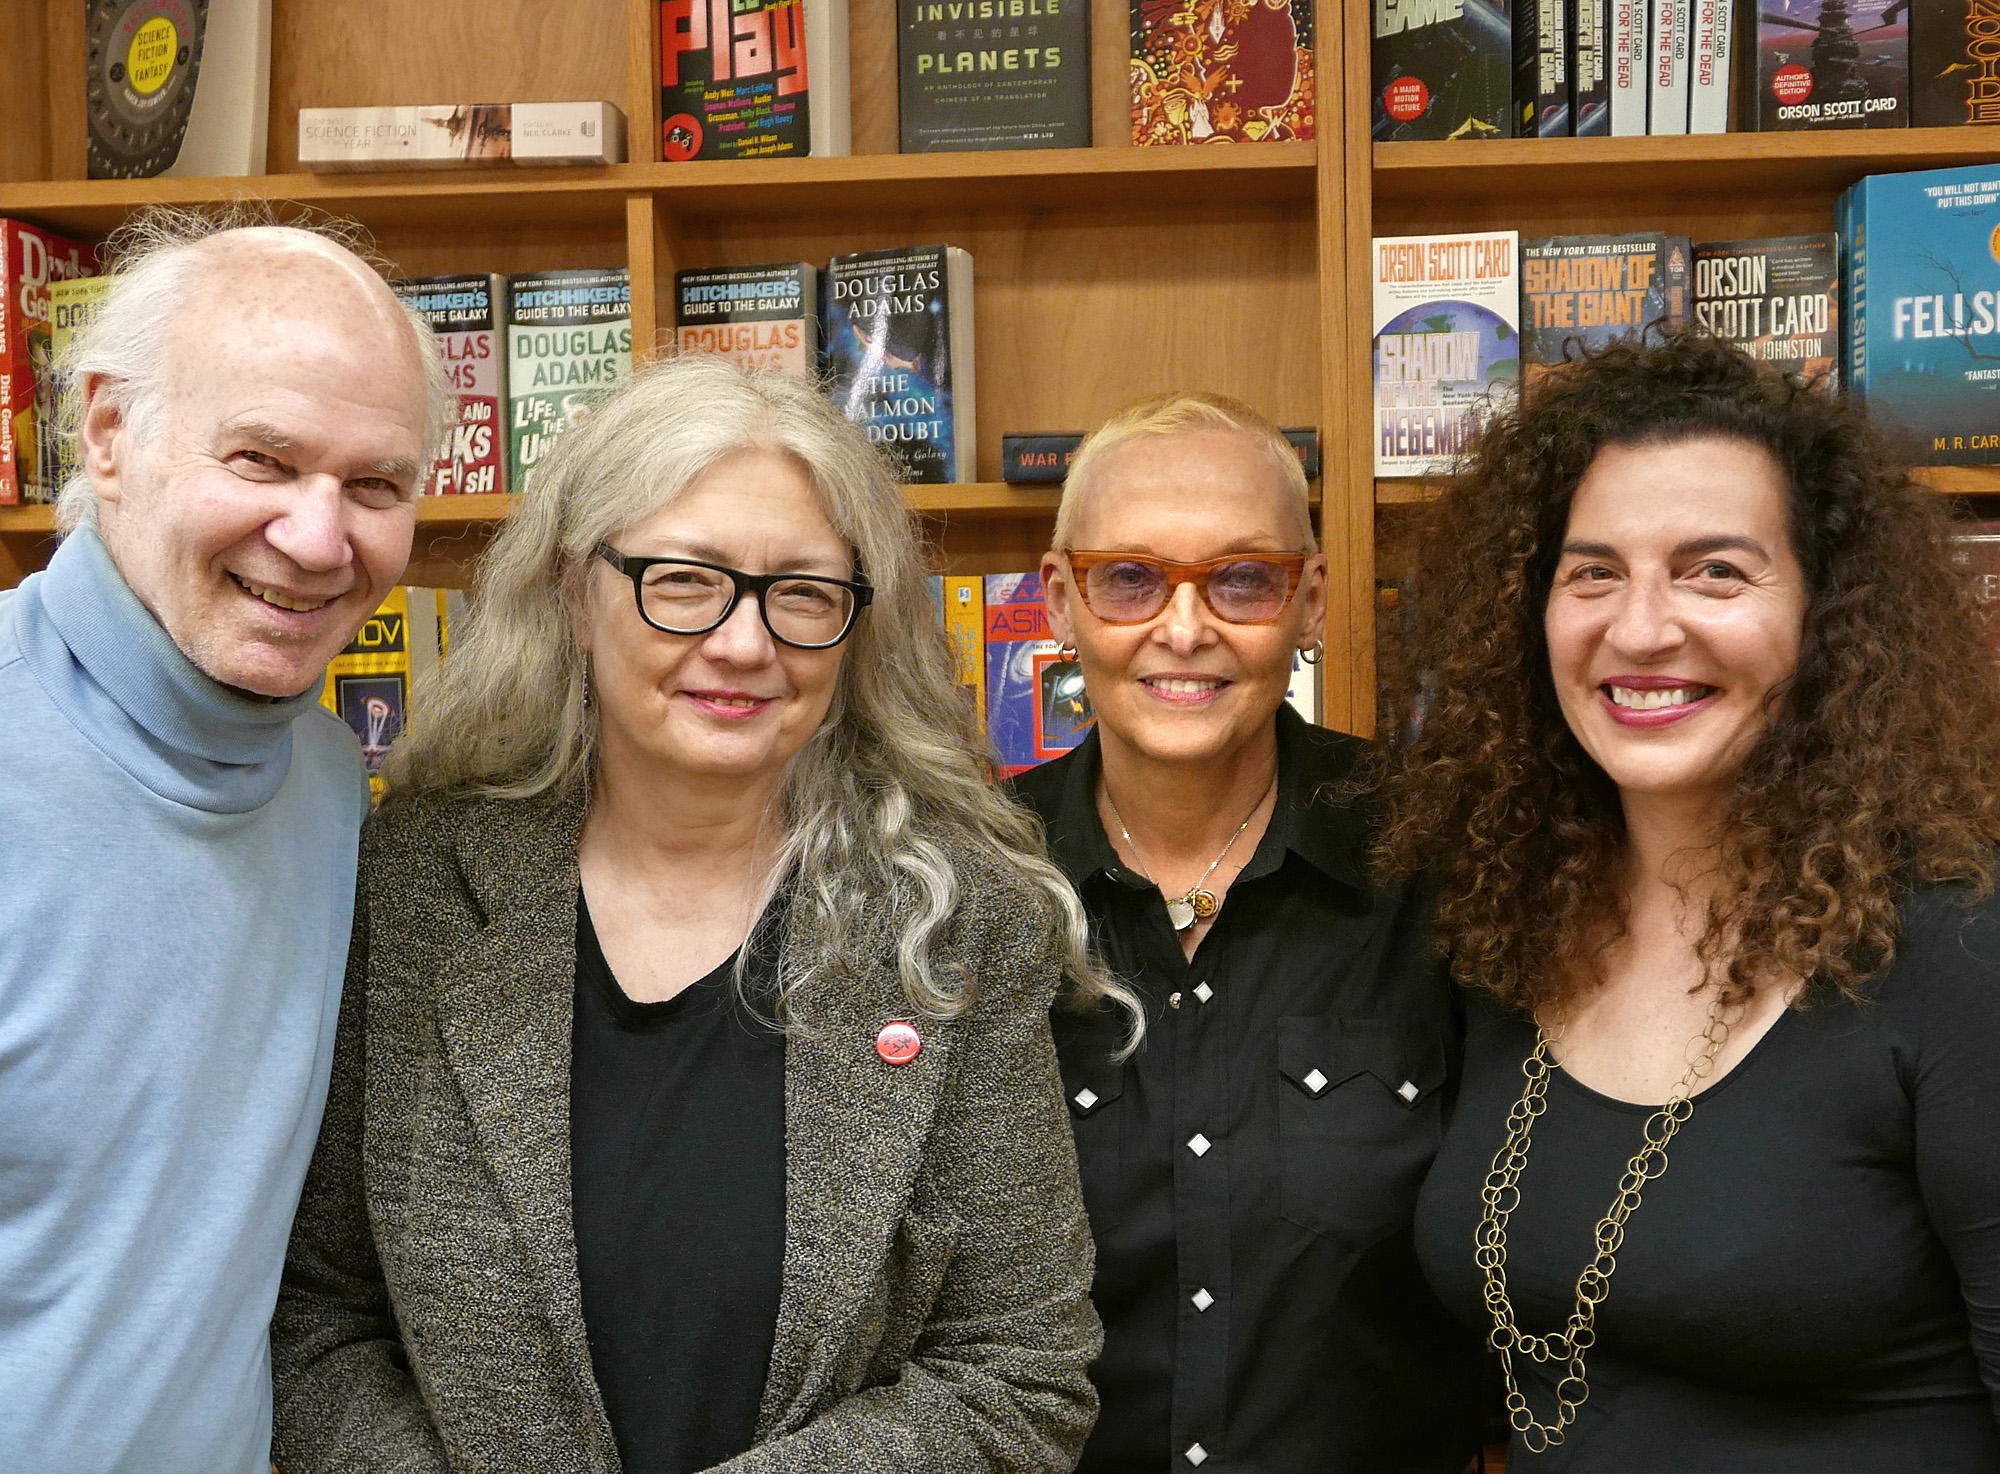 Richard Silberg, Joyce Jenkins, Jan Beatty & Kendra Tanacea